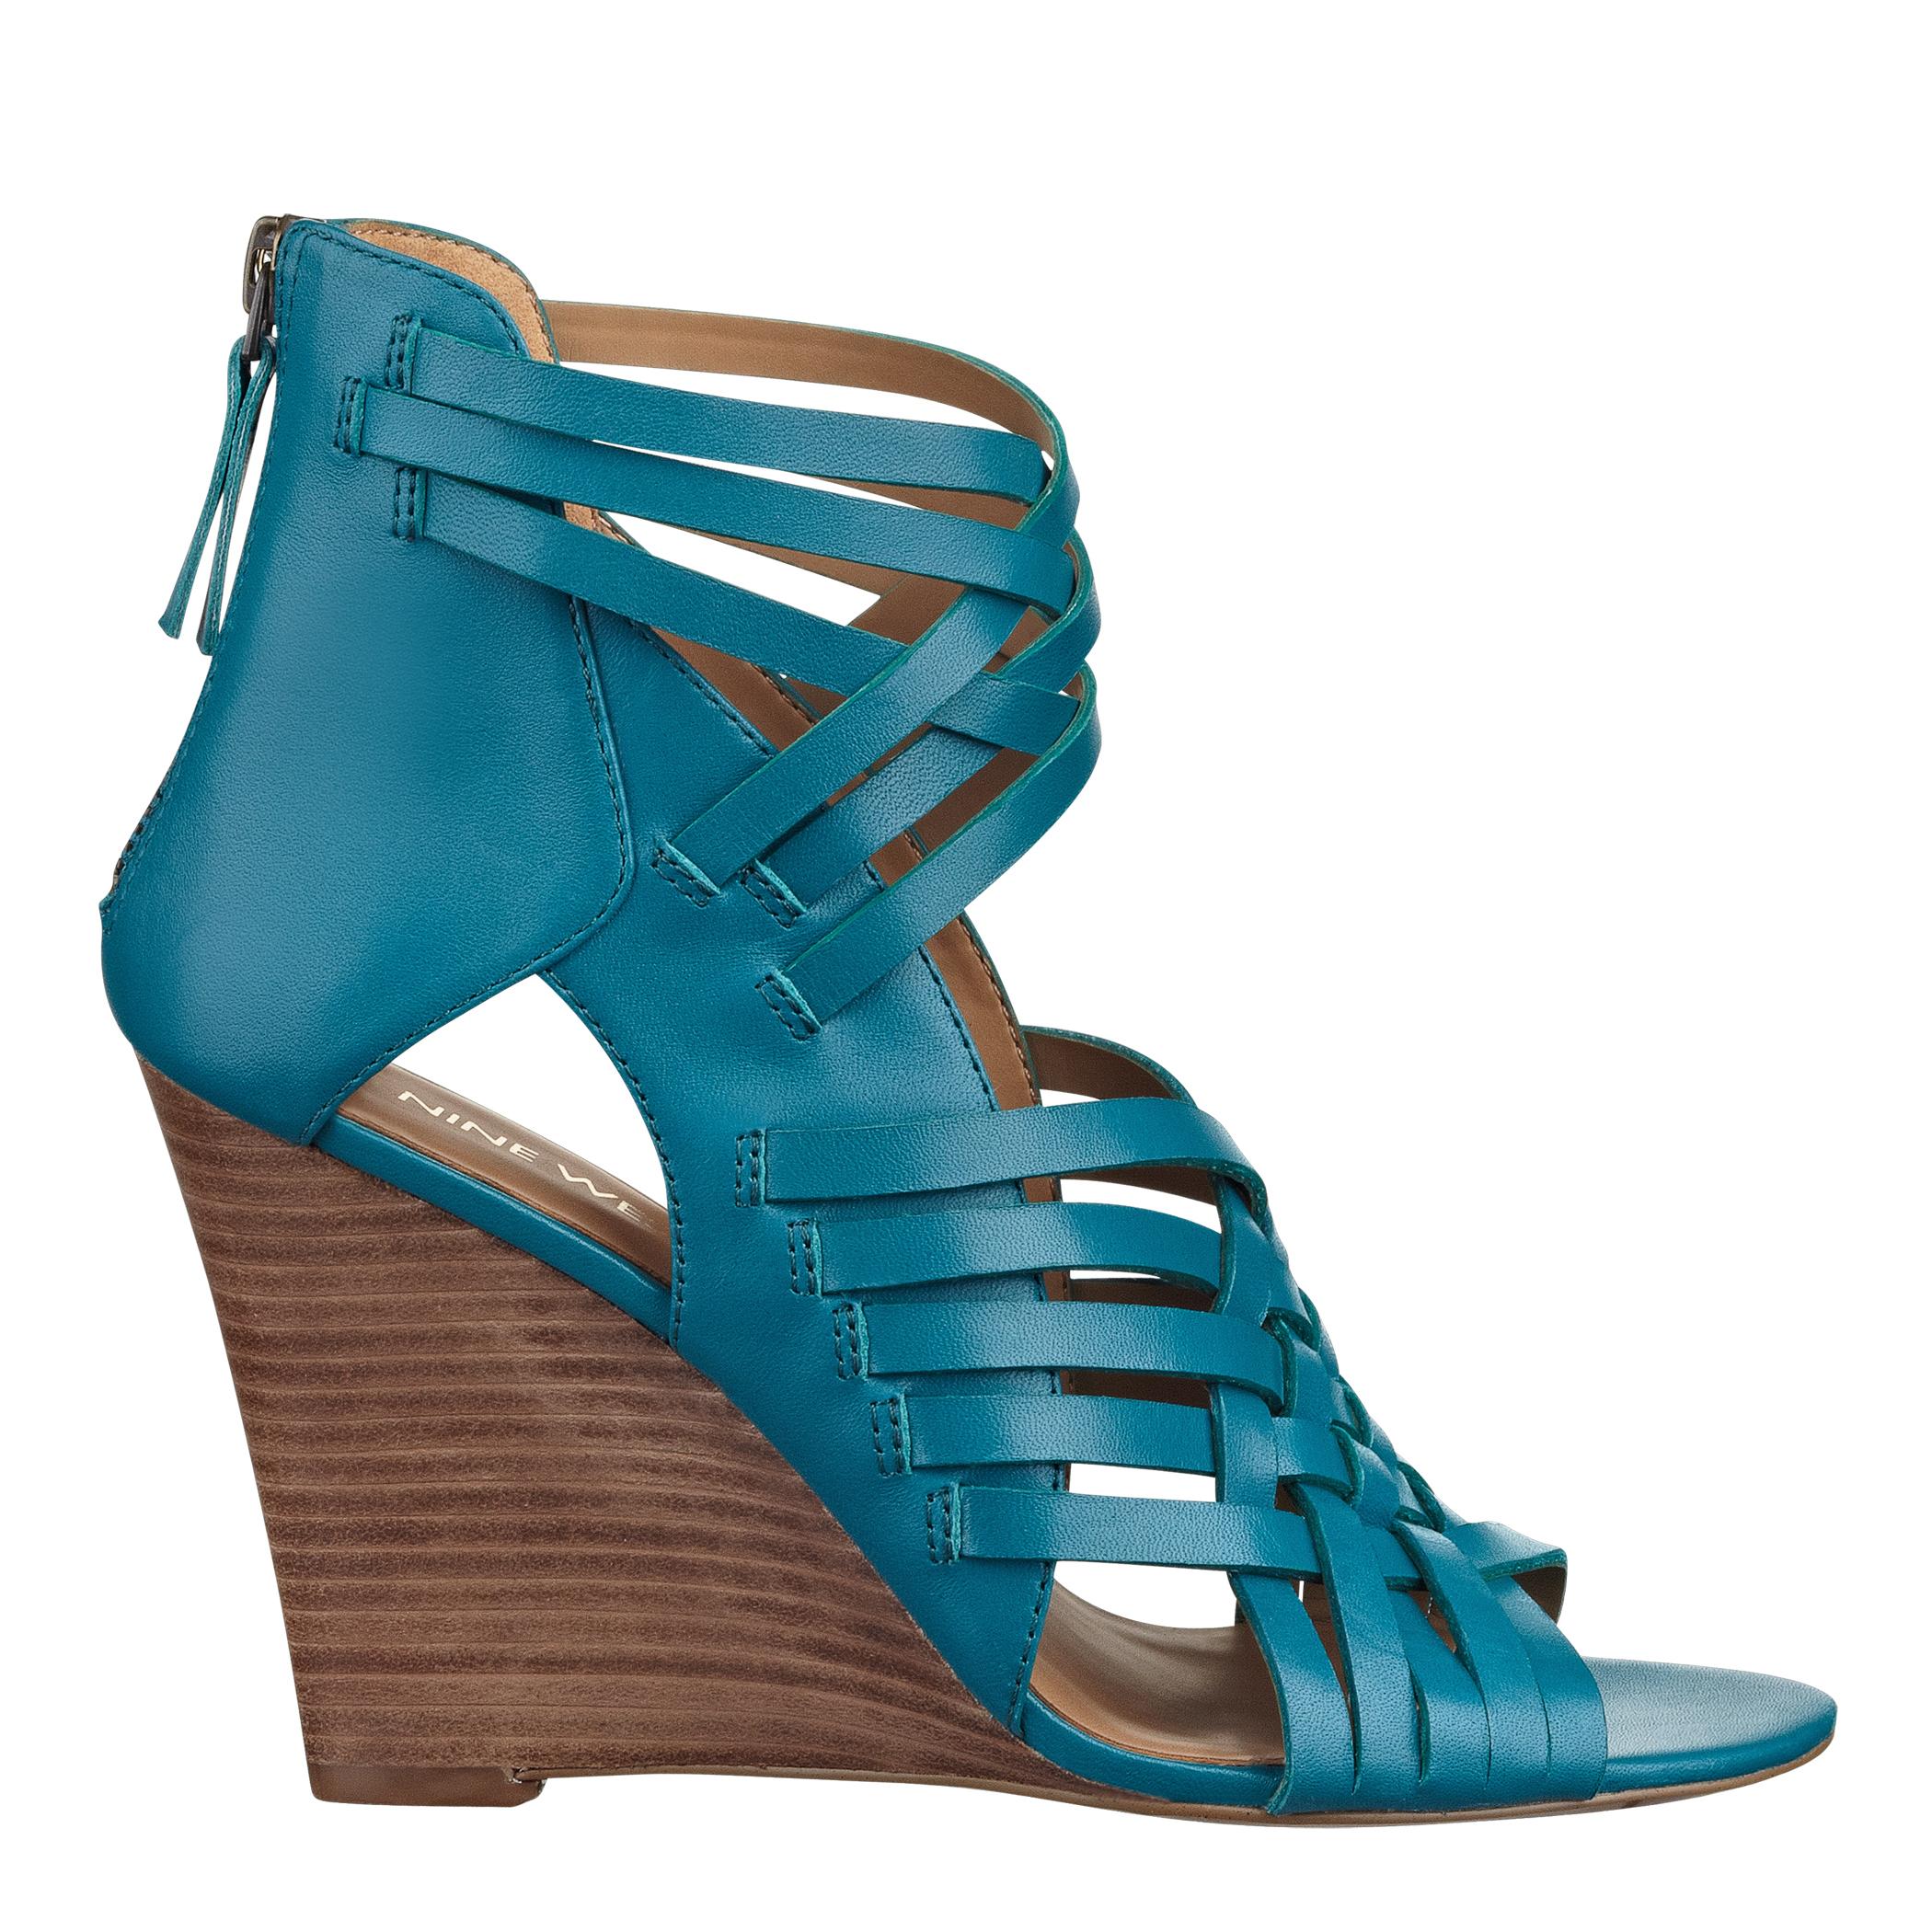 581c26667adf Lyst - Nine West Mexicali Peep Toe Wedge in Blue